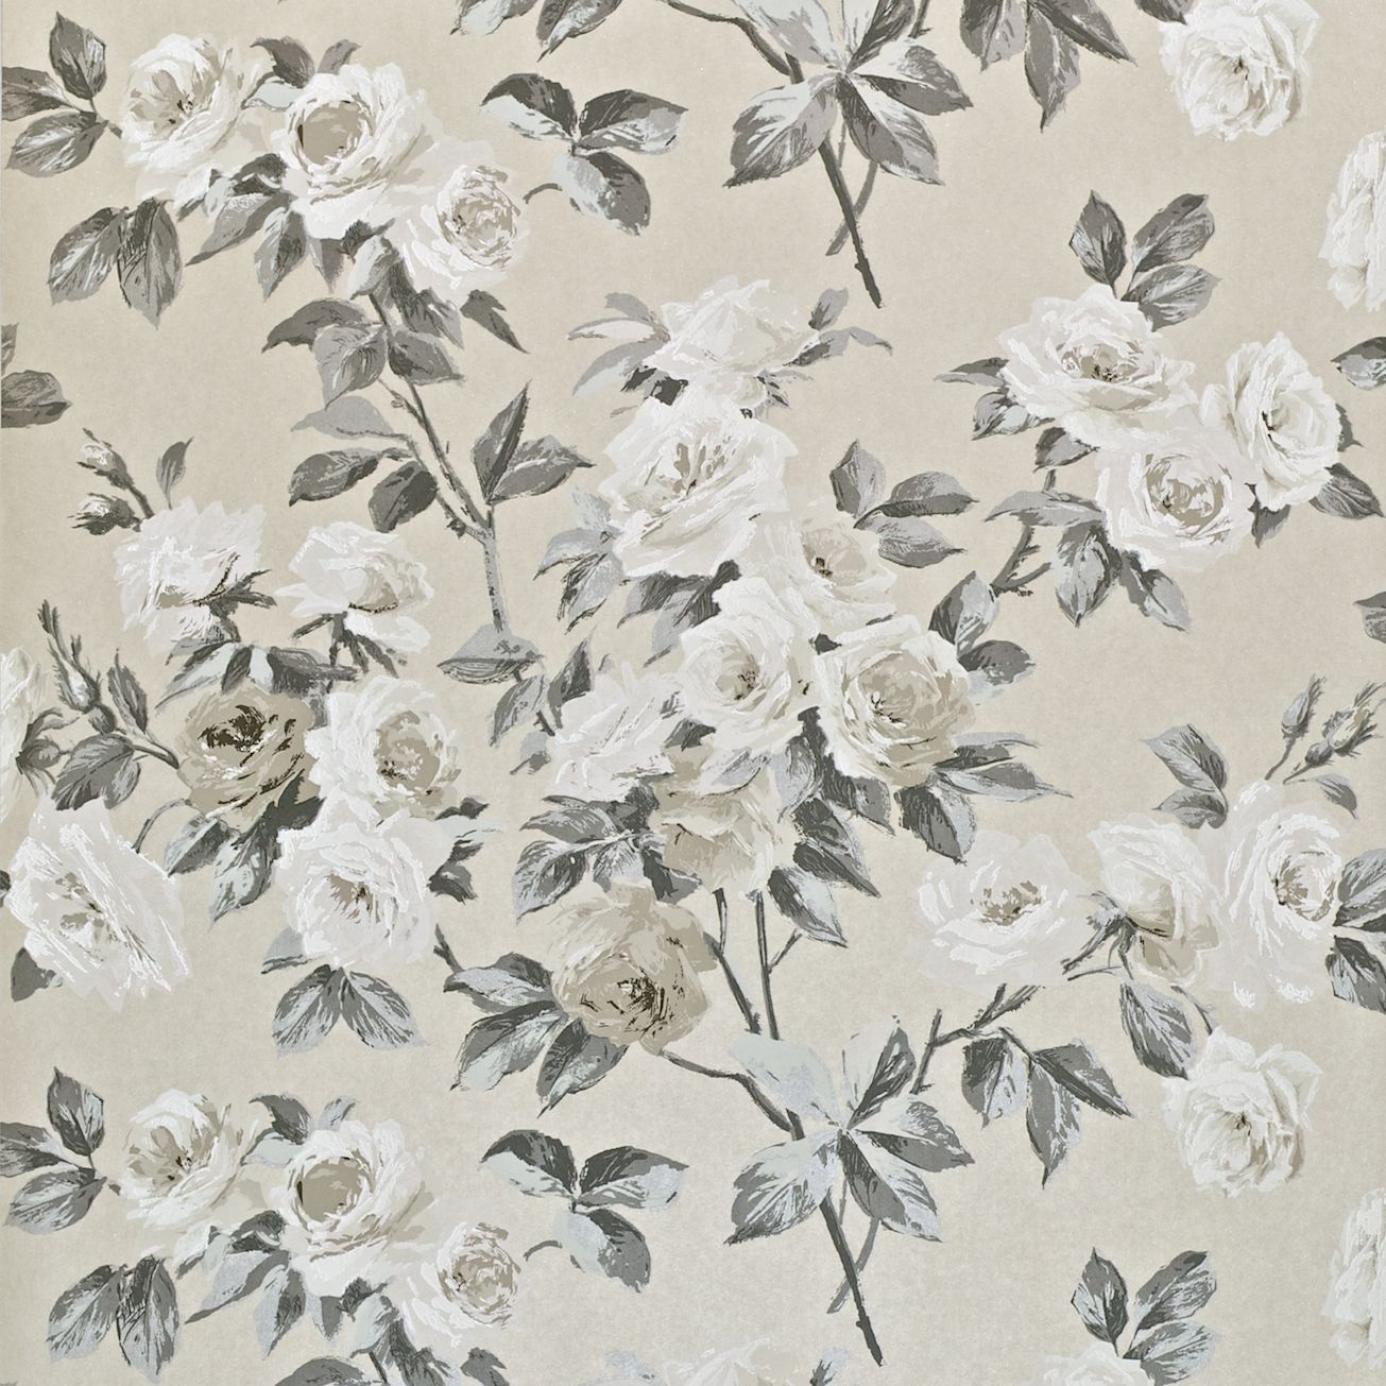 Pin Home Wallpapers Sanderson Vintage Wallpapers Primavera